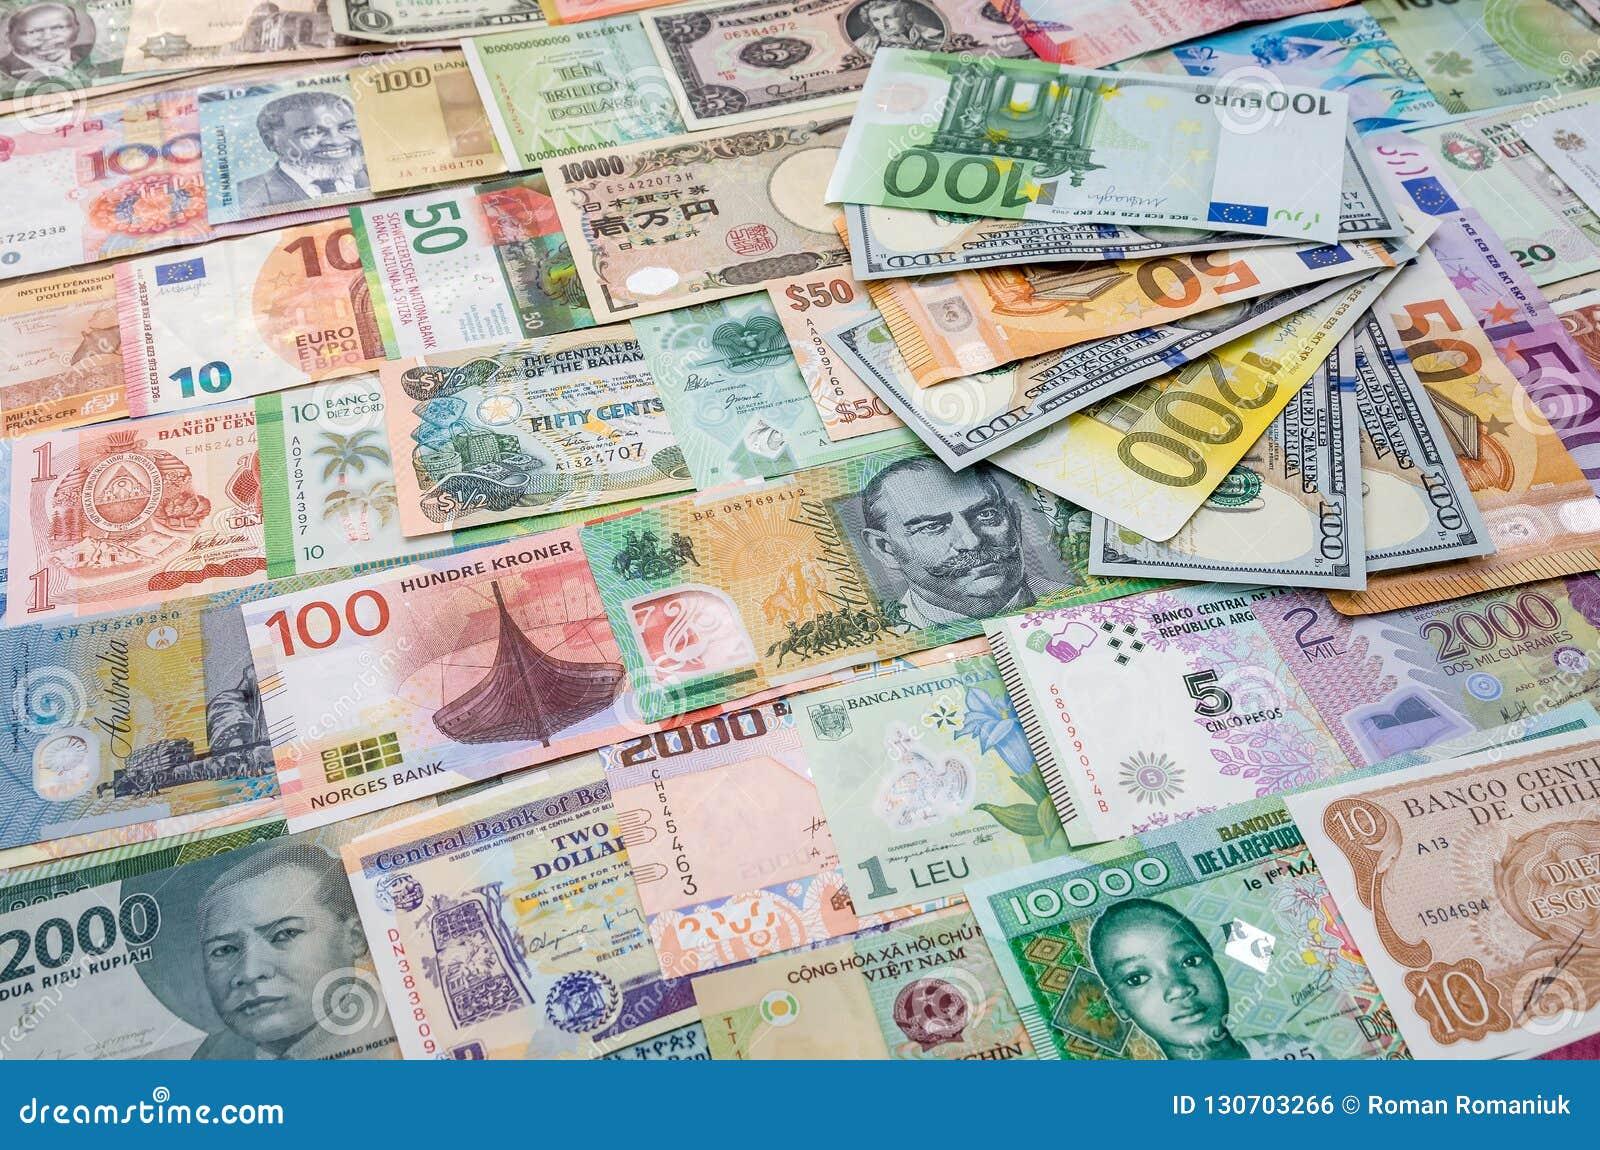 Euro And Dollar Banknotes On World Money Stock Photo - Image